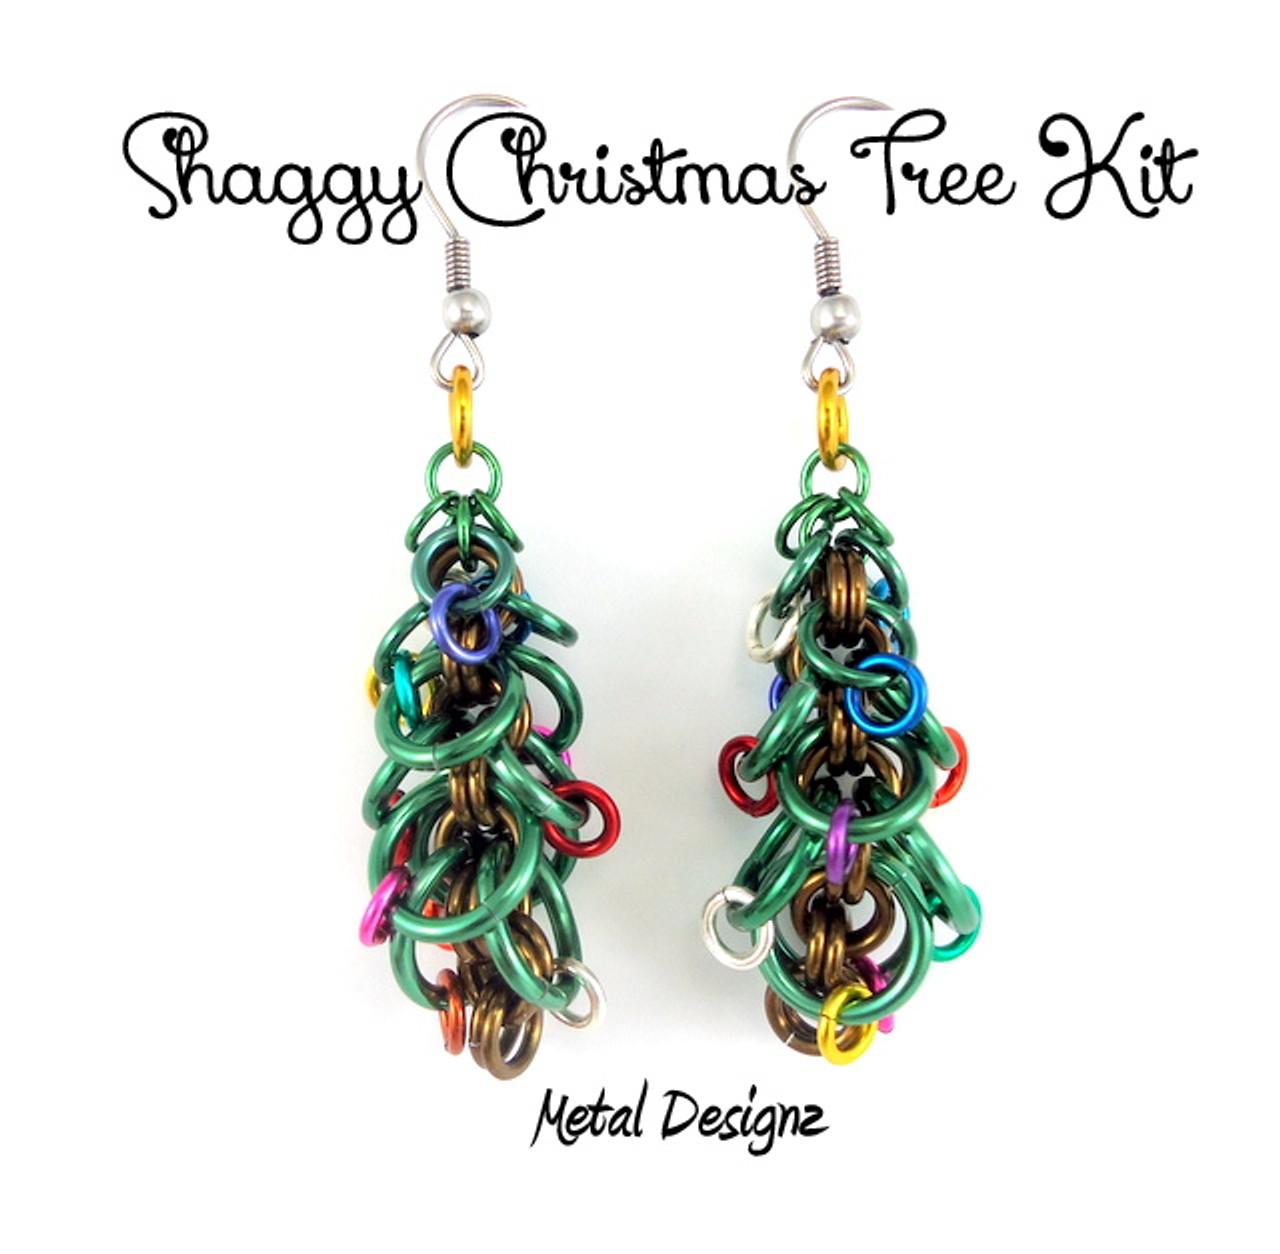 b9b3ab33d14fd Shaggy Christmas Tree Earring Kit